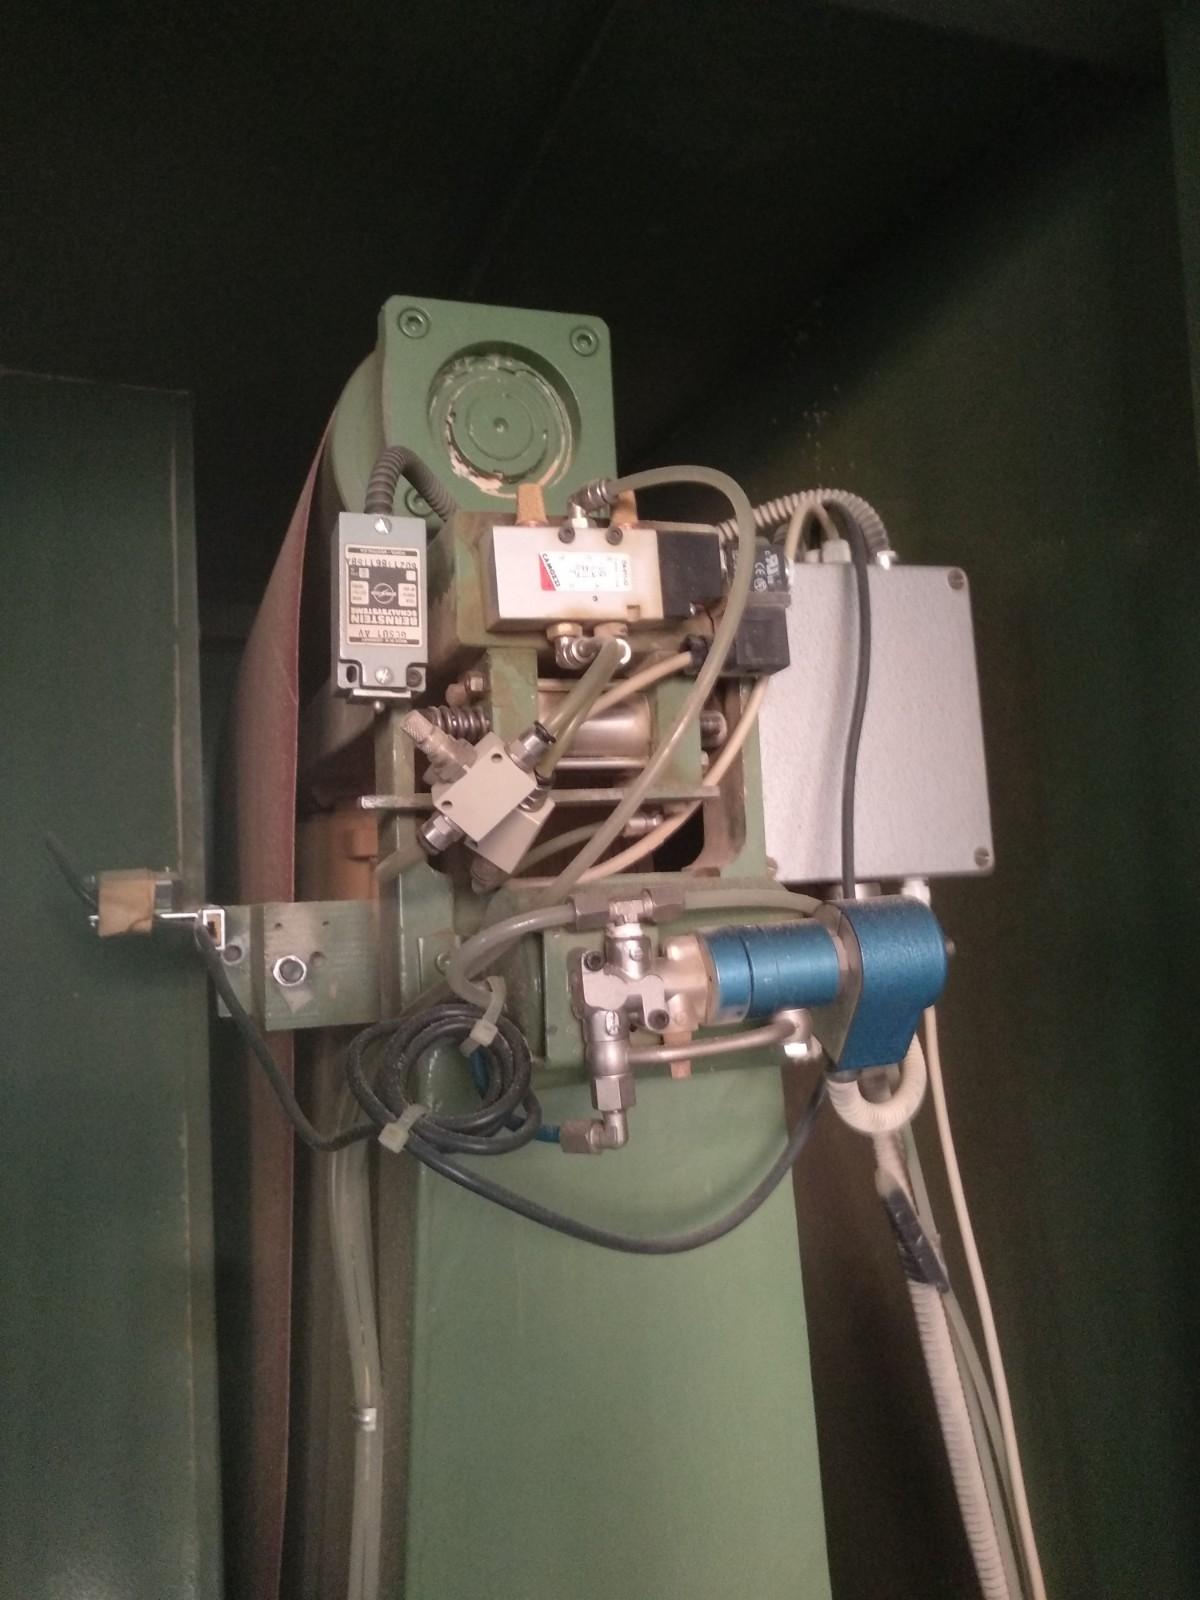 calibratrice marca stemac in vendita - foto 2